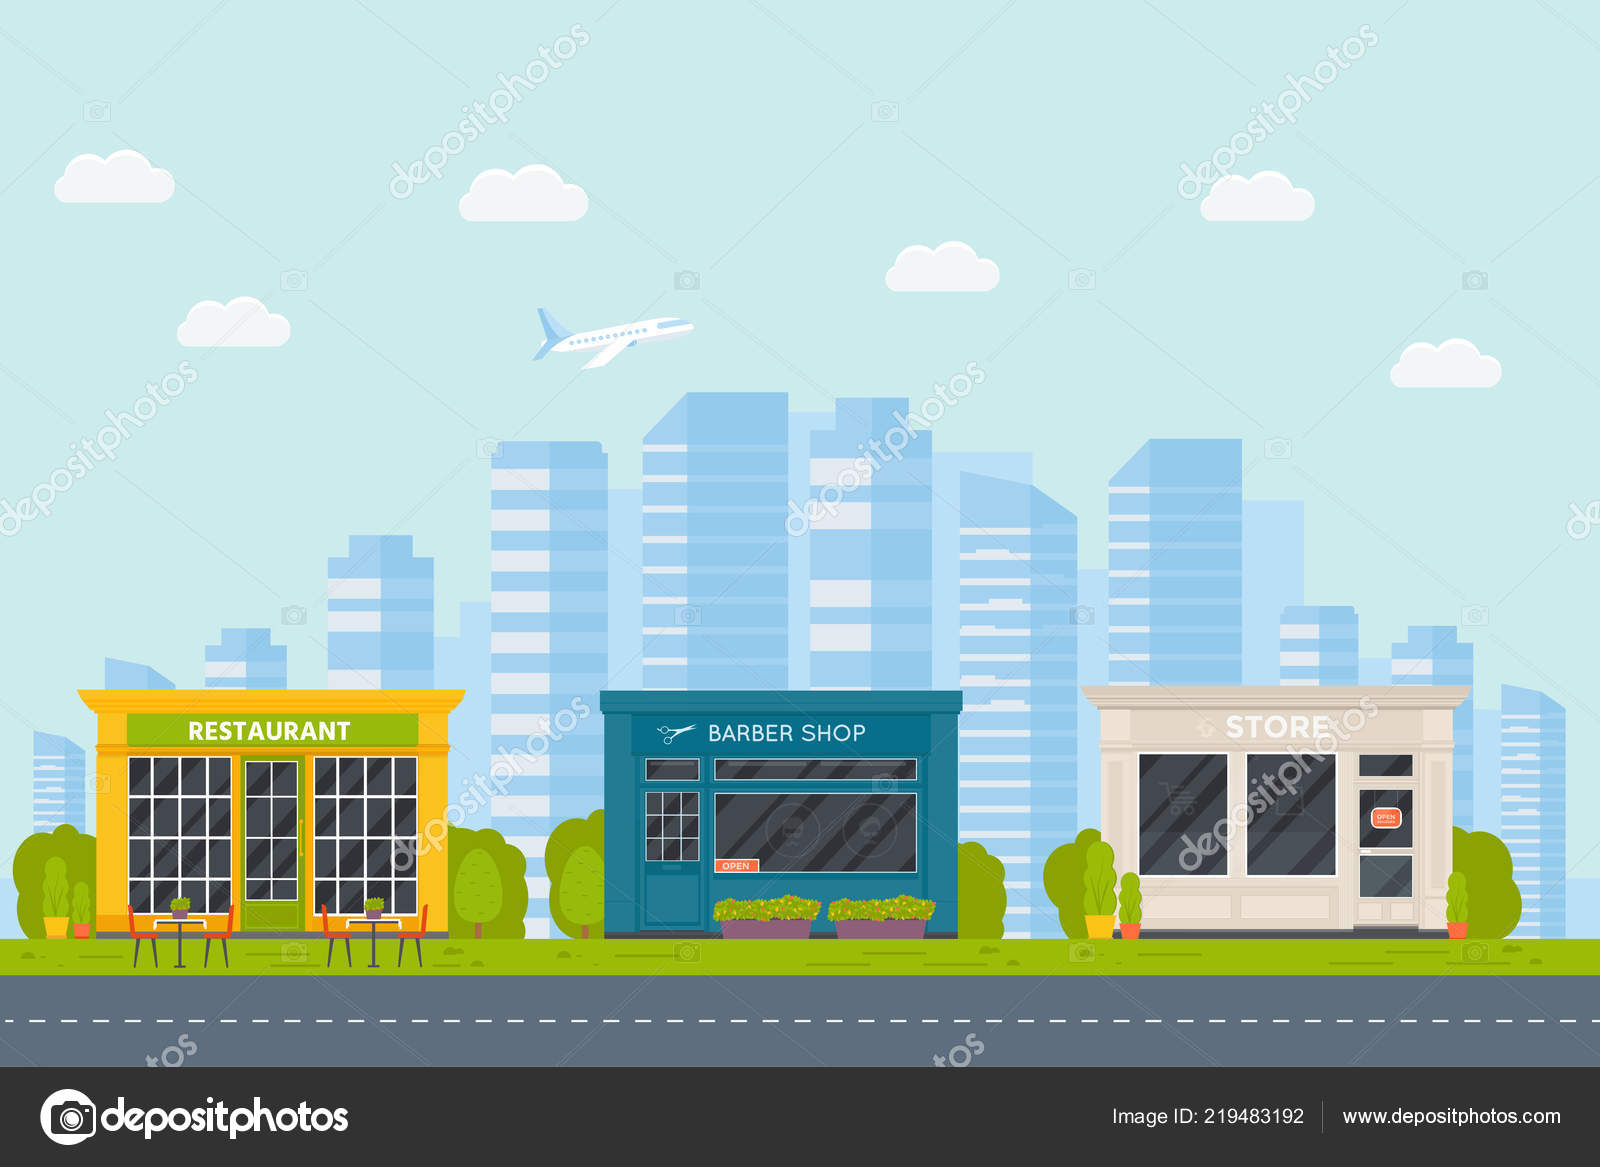 Set Vector Flat Design Restaurants Exterior Shops Facade Barber Shop Stock Vector C Tanyasun 219483192